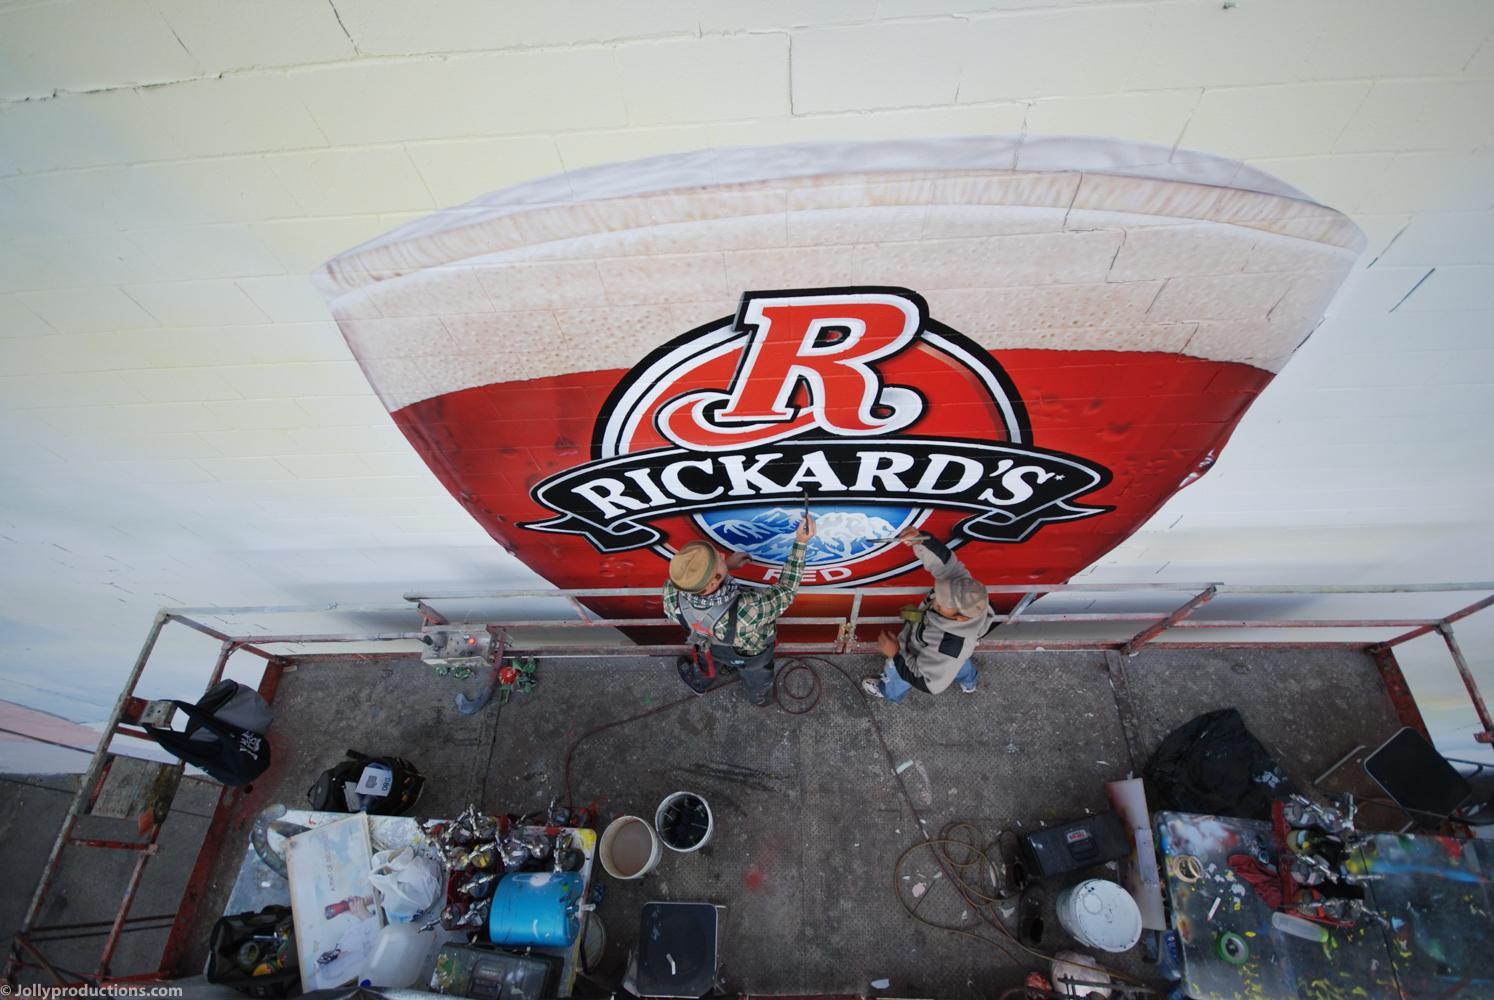 Rickard's mural